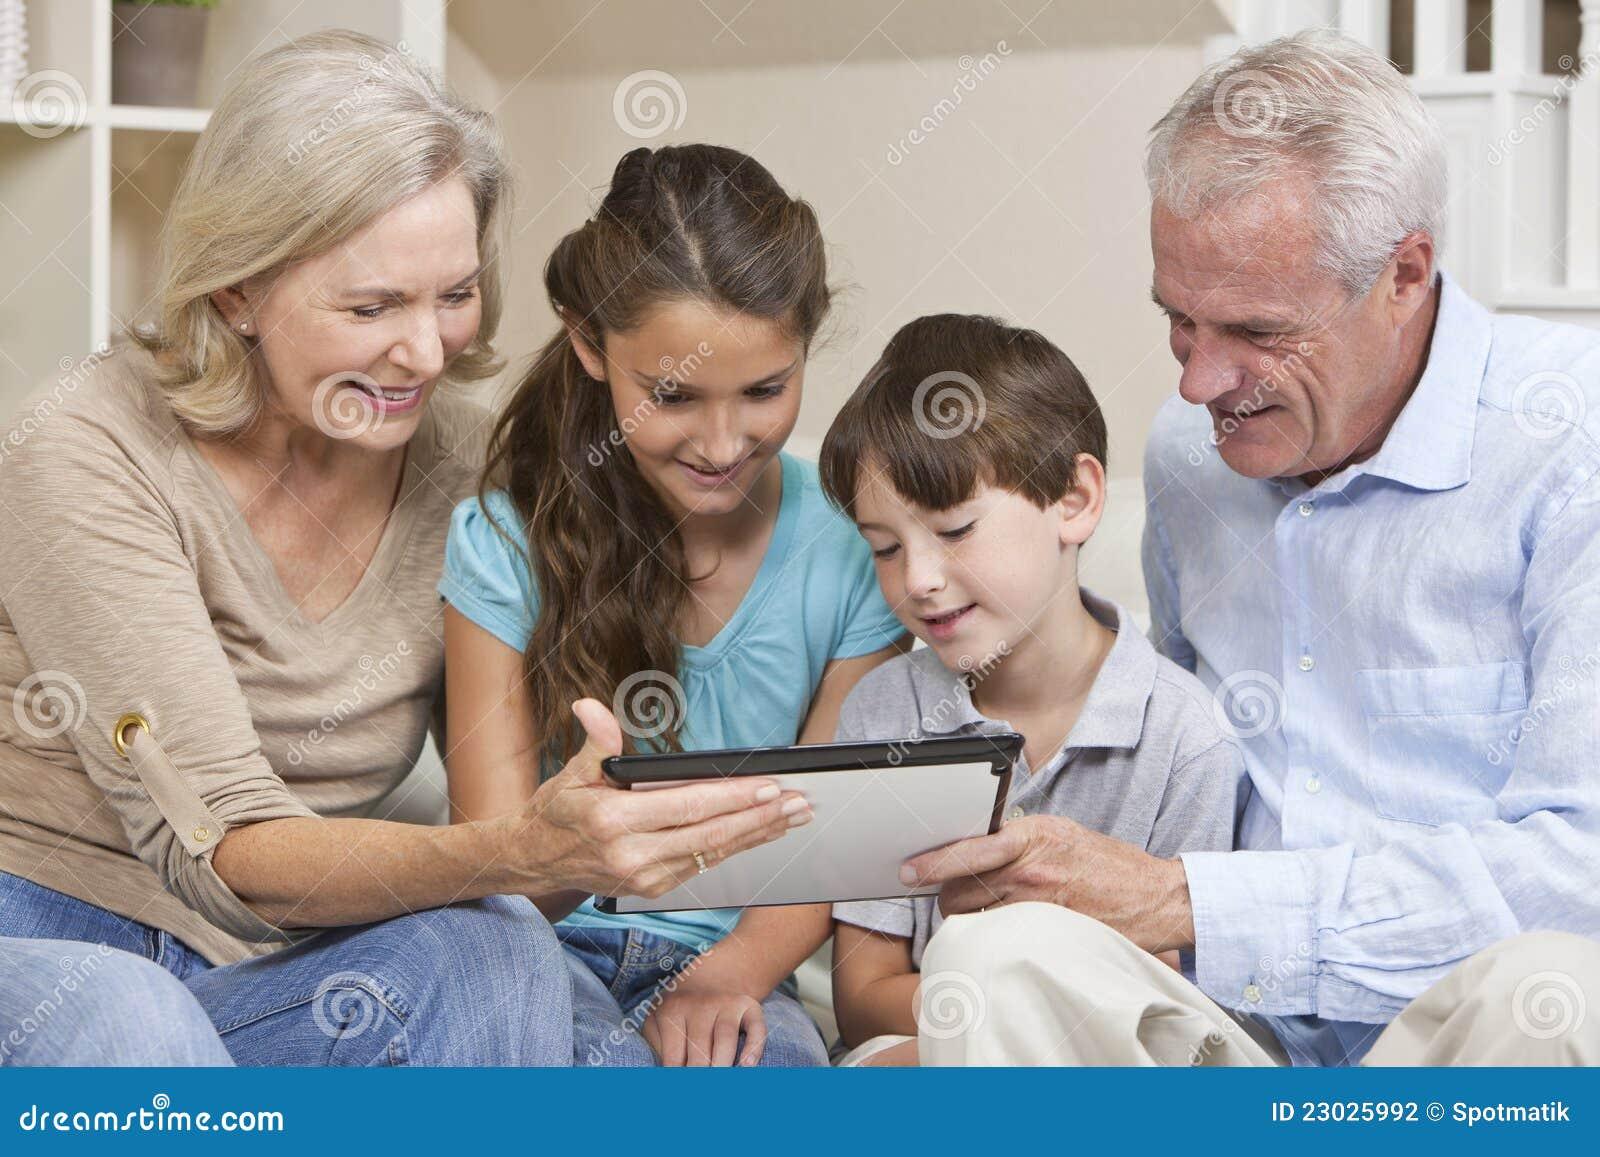 Grandparents & Grandchildren Tablet Computer